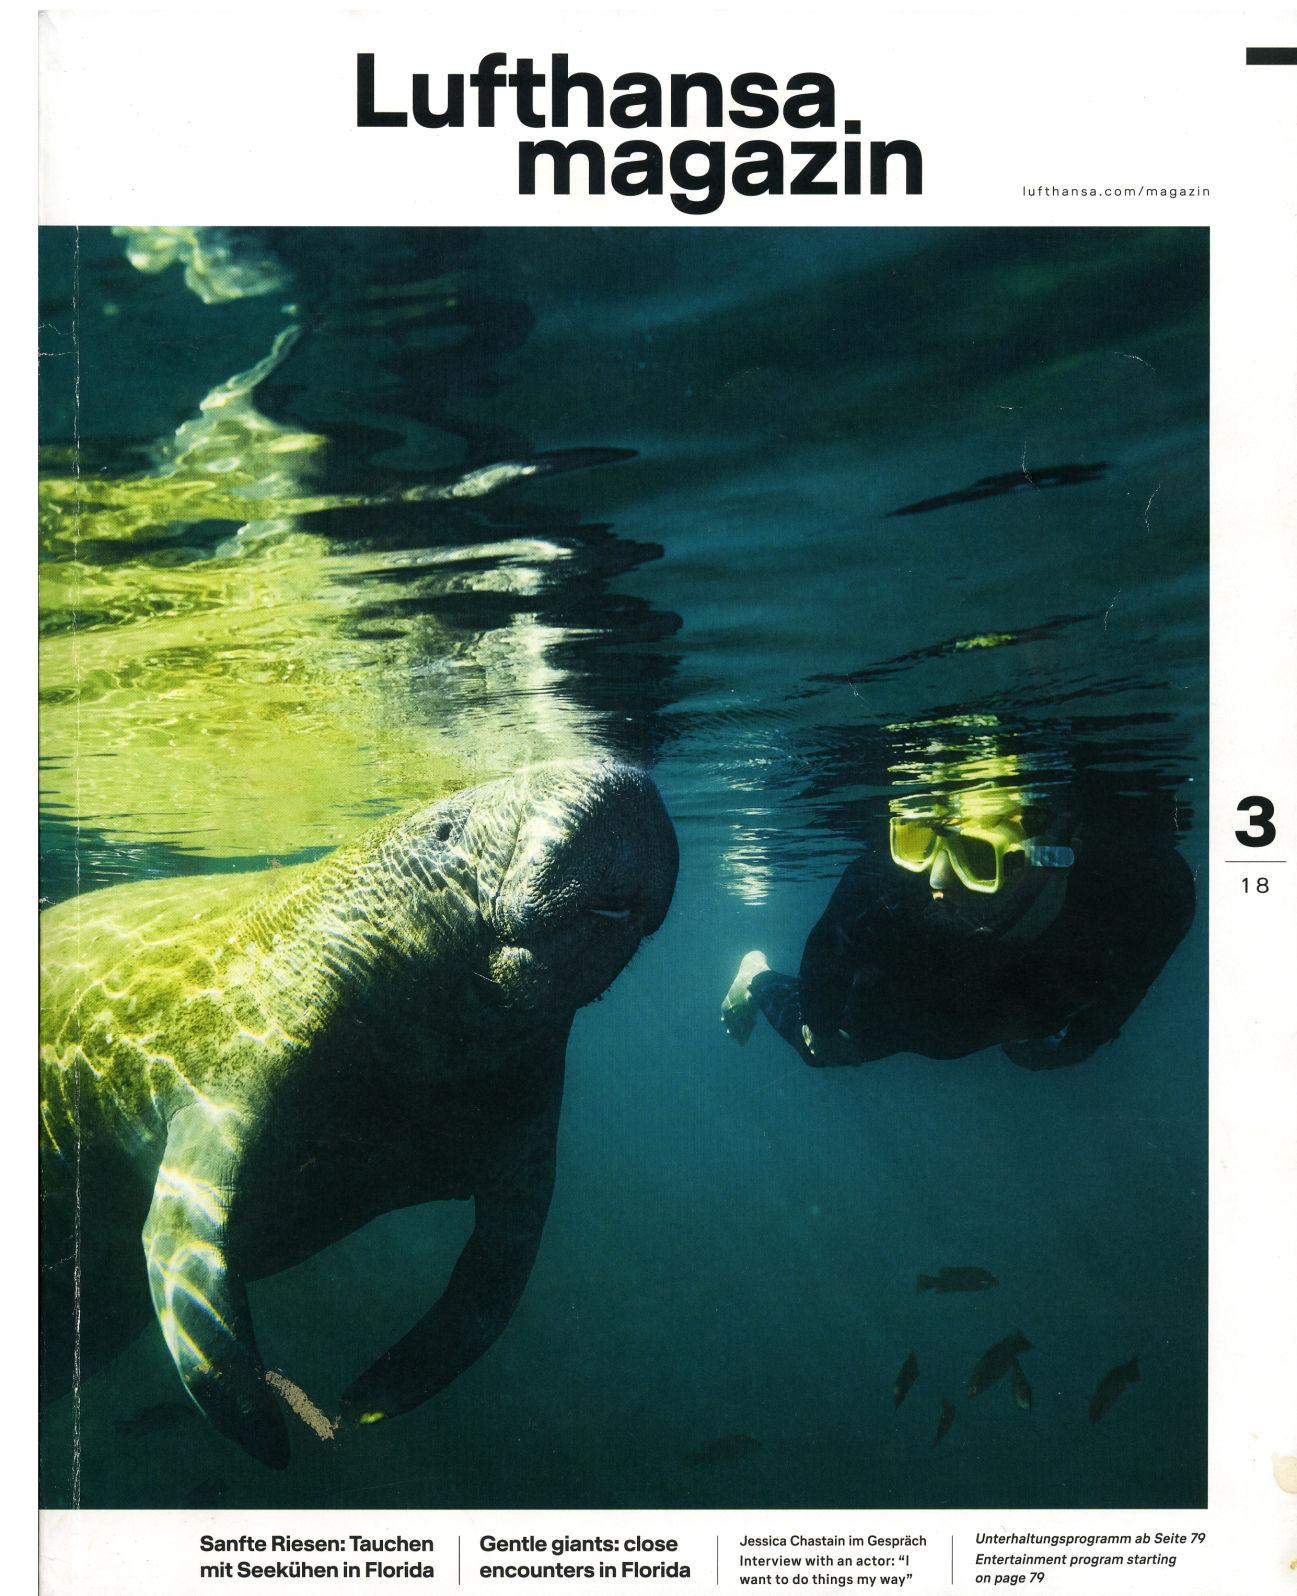 Lufthansa magazin cover | Local News |